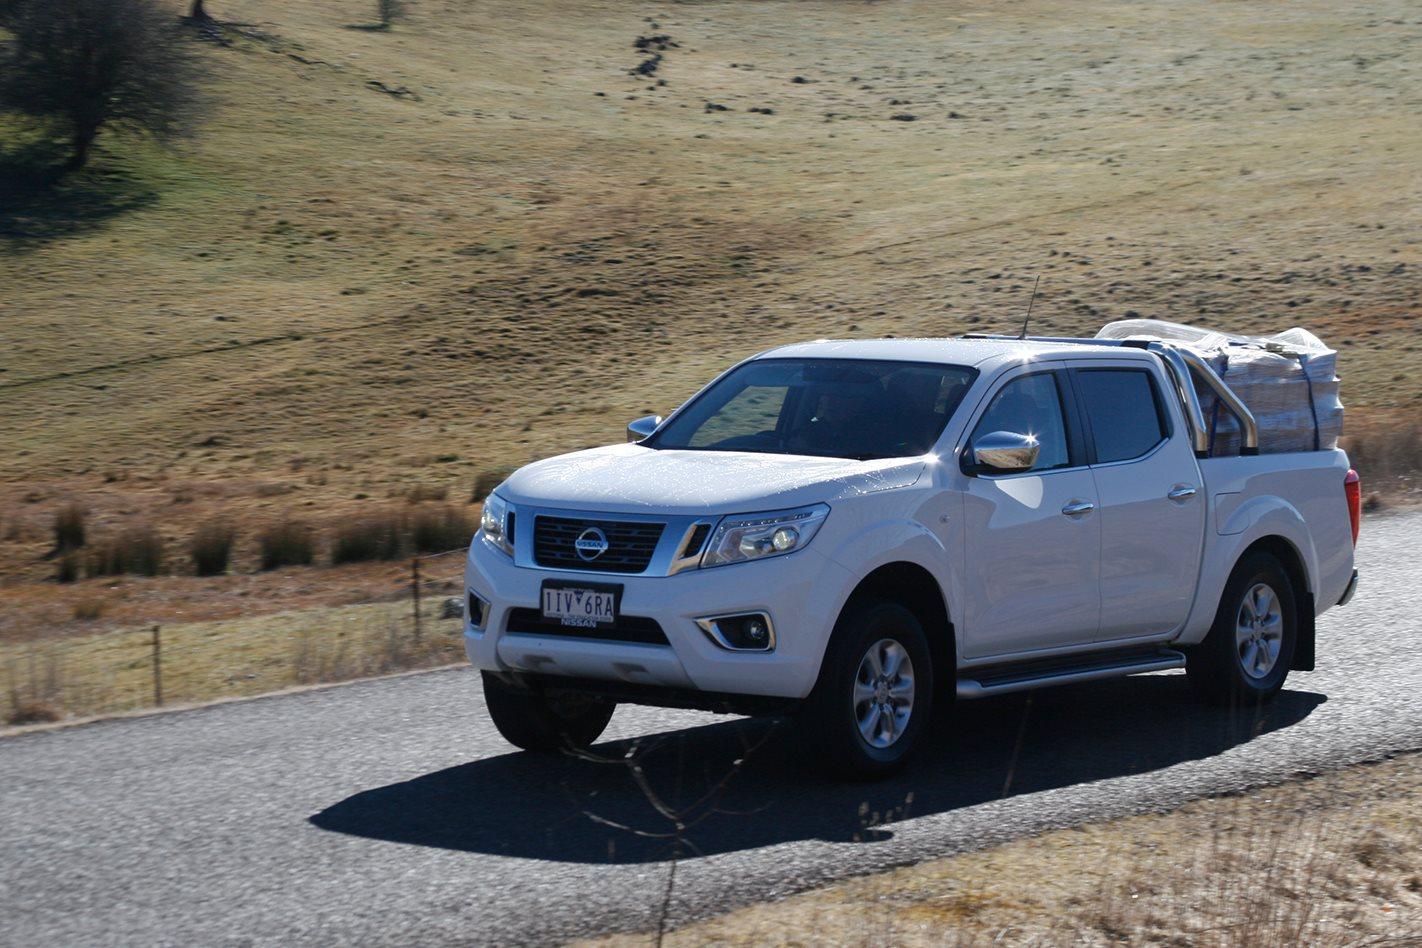 2017-Nissan-Navara-II-exterior.jpg